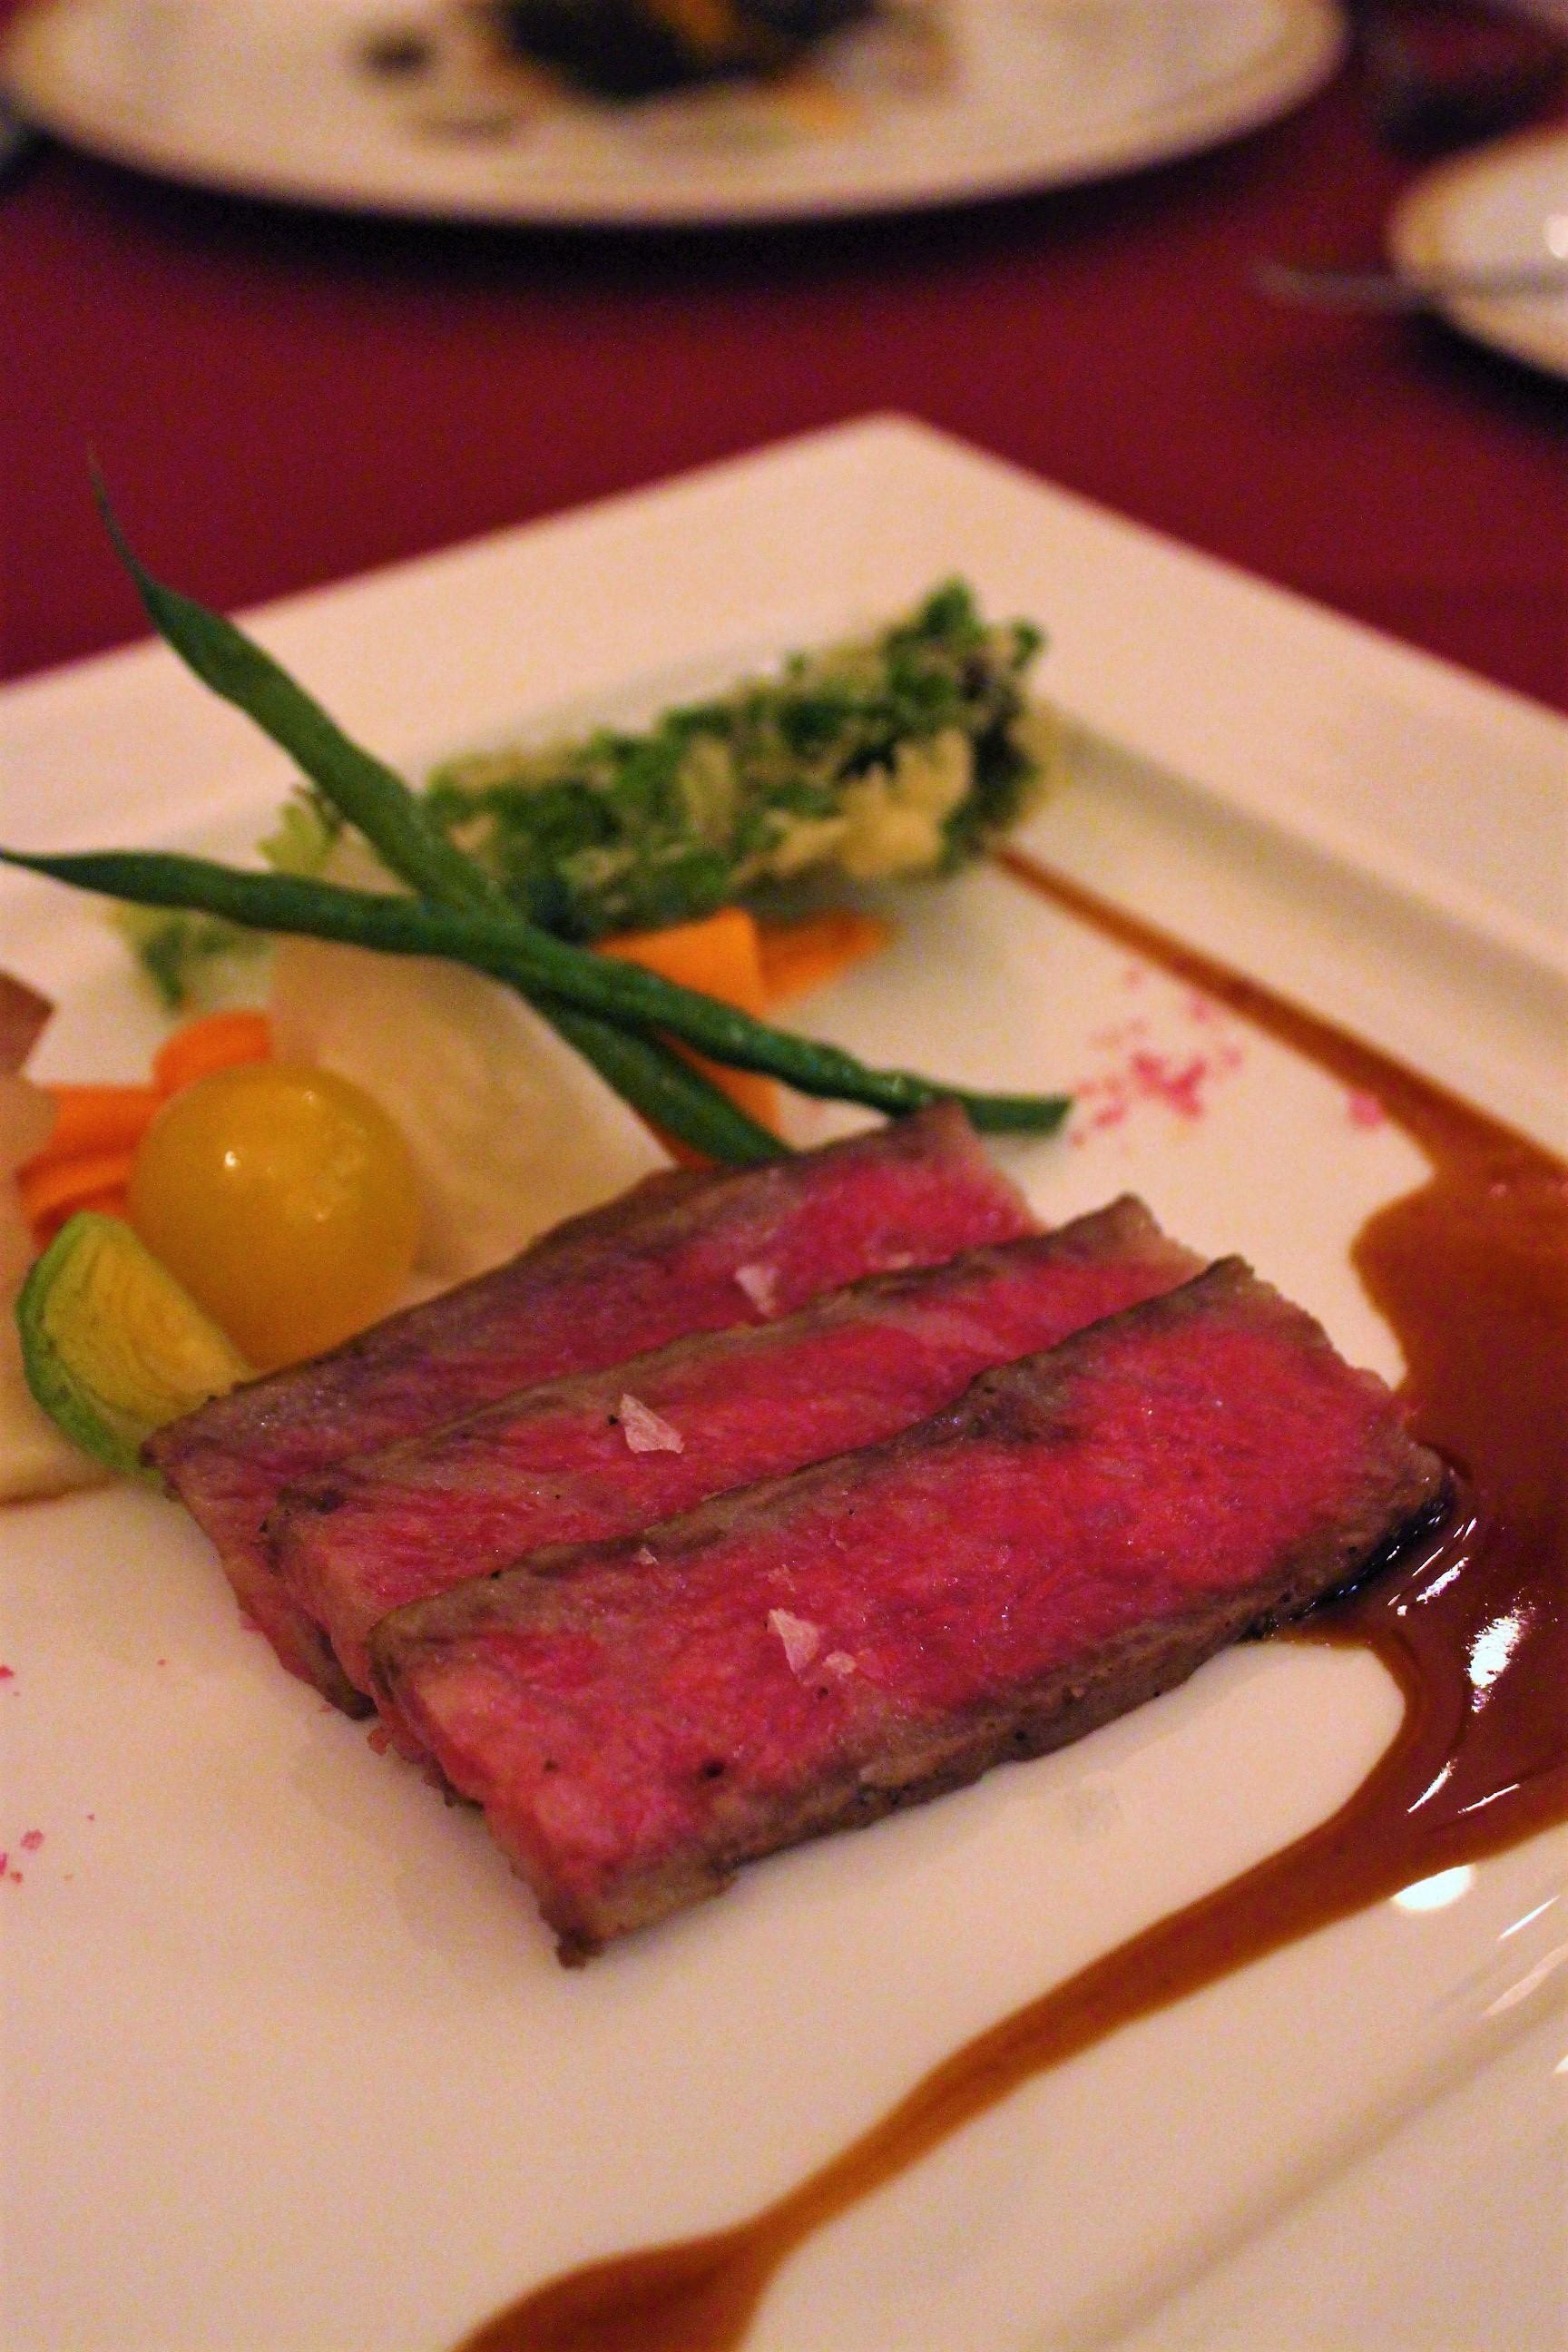 Roasted Kuroge Wagyu Beef topped with Madeira Sauce and Pink Crystal Salt at Magellan's in DisneySea, Tokyo, Japan